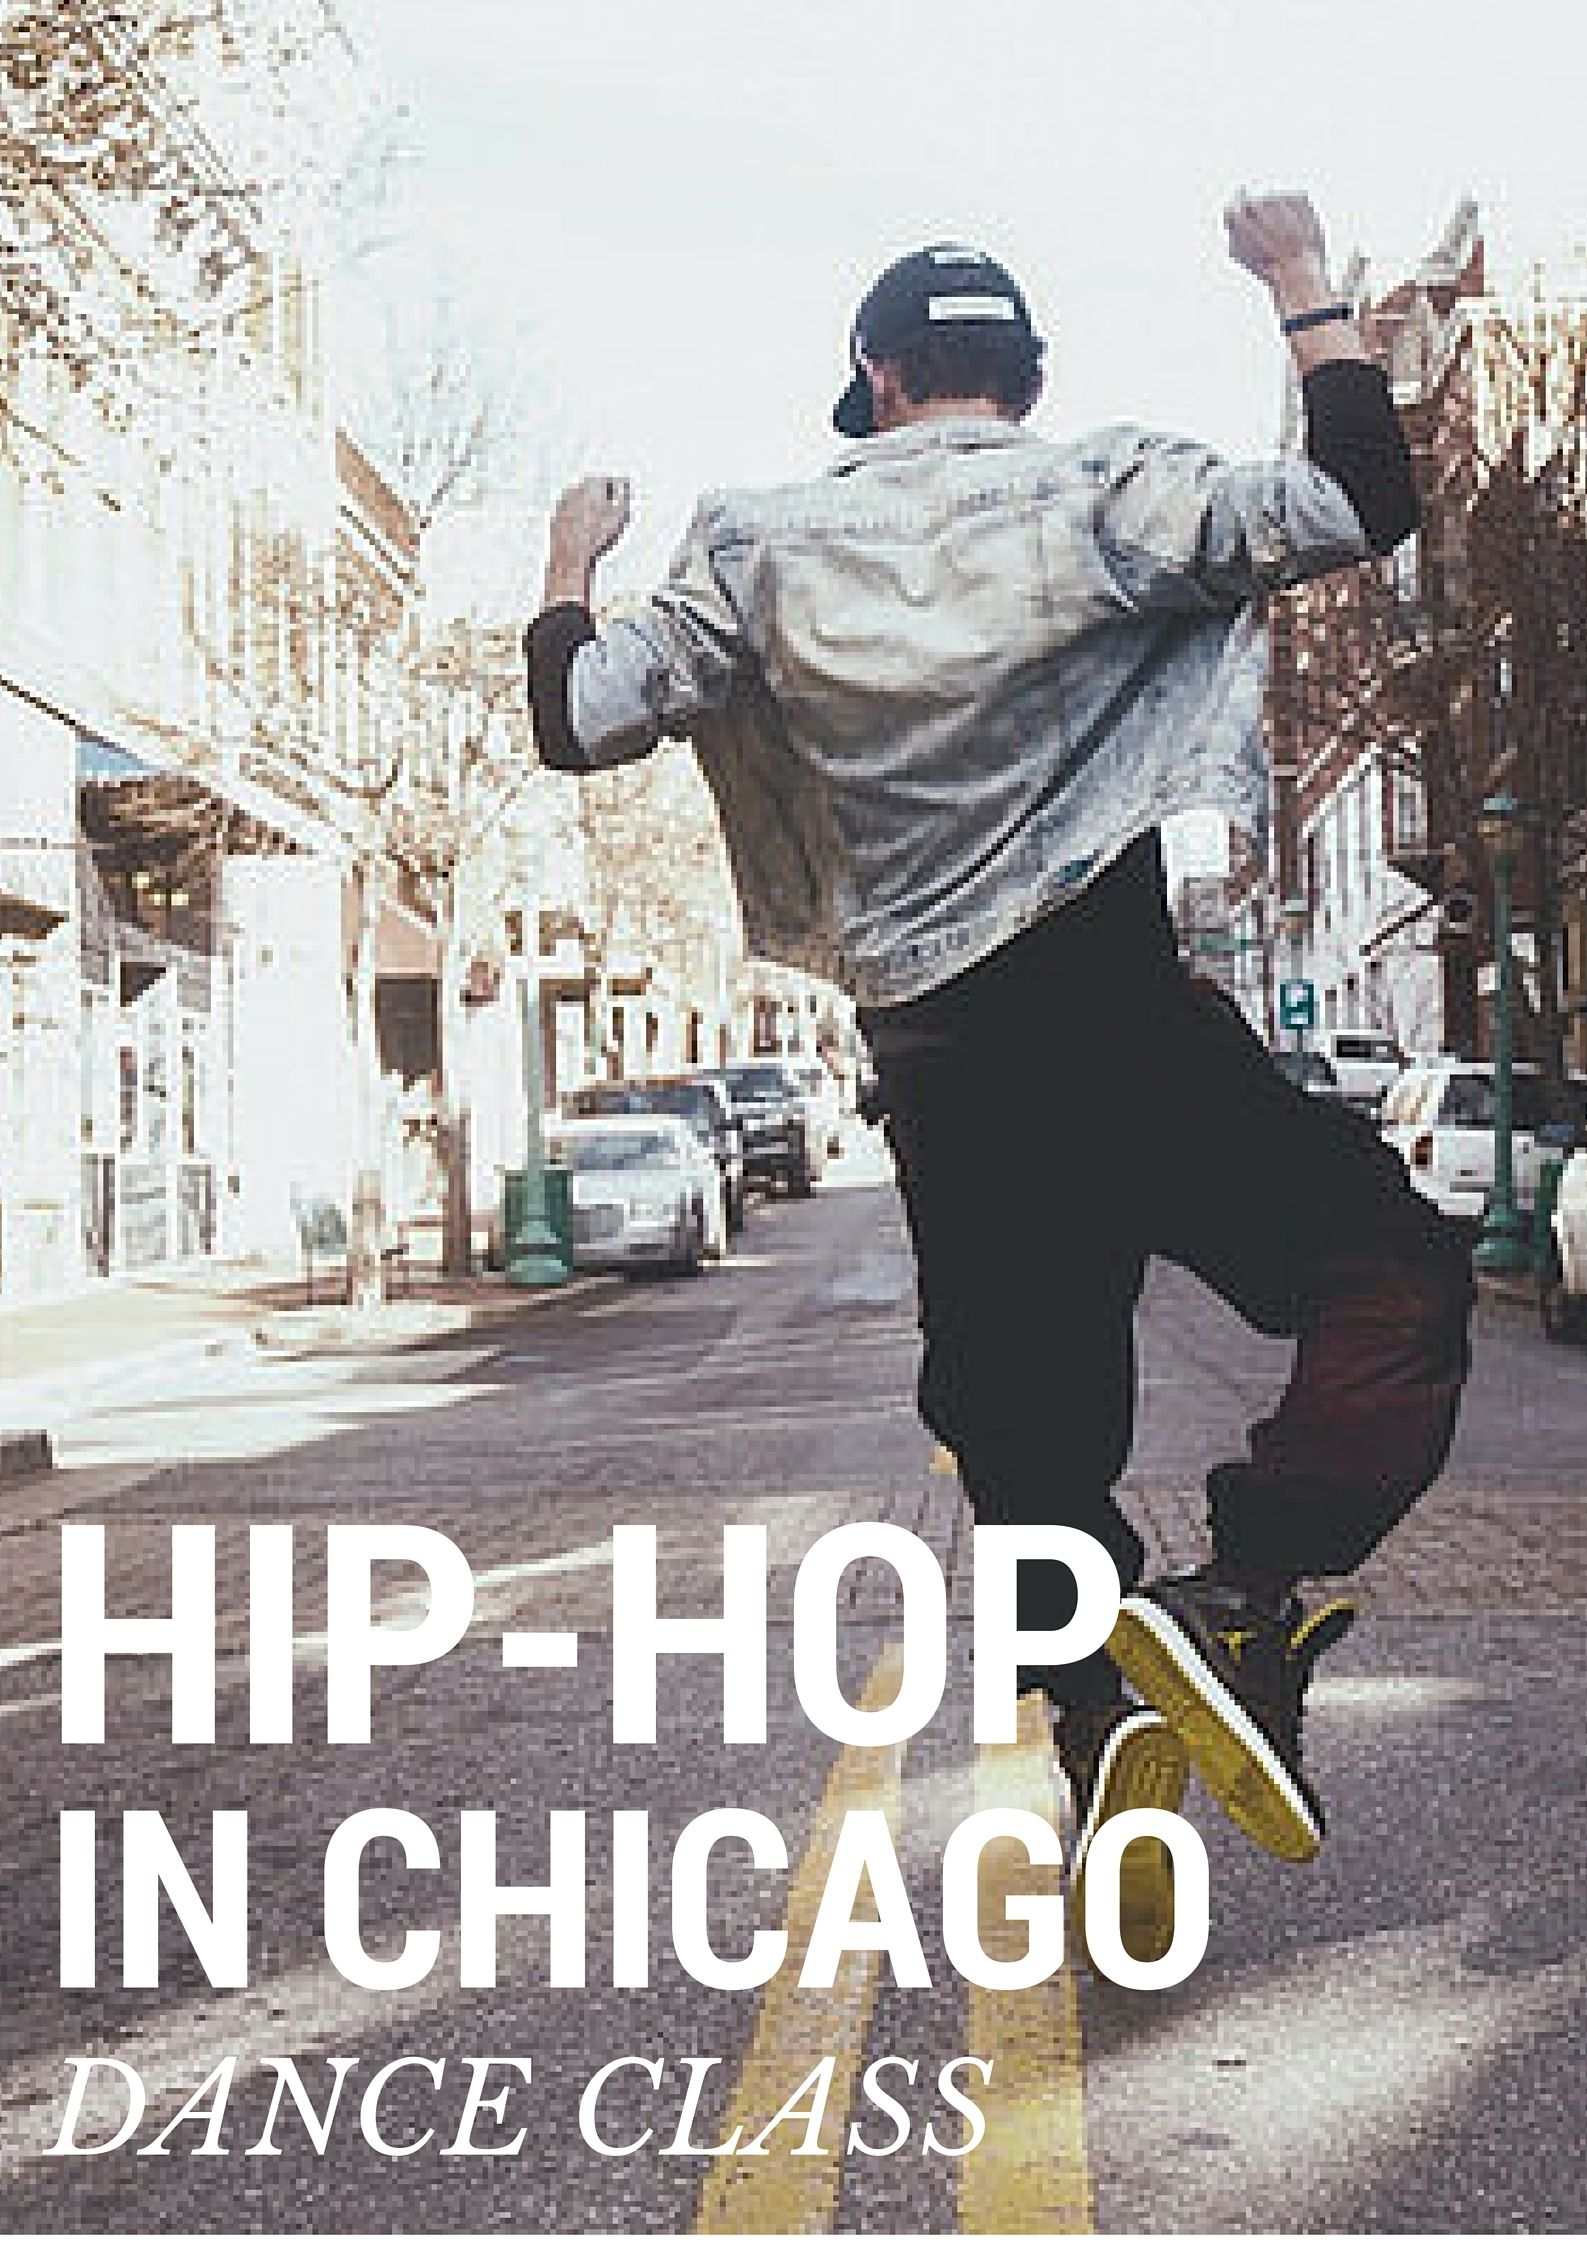 dance classes for adults hip hop